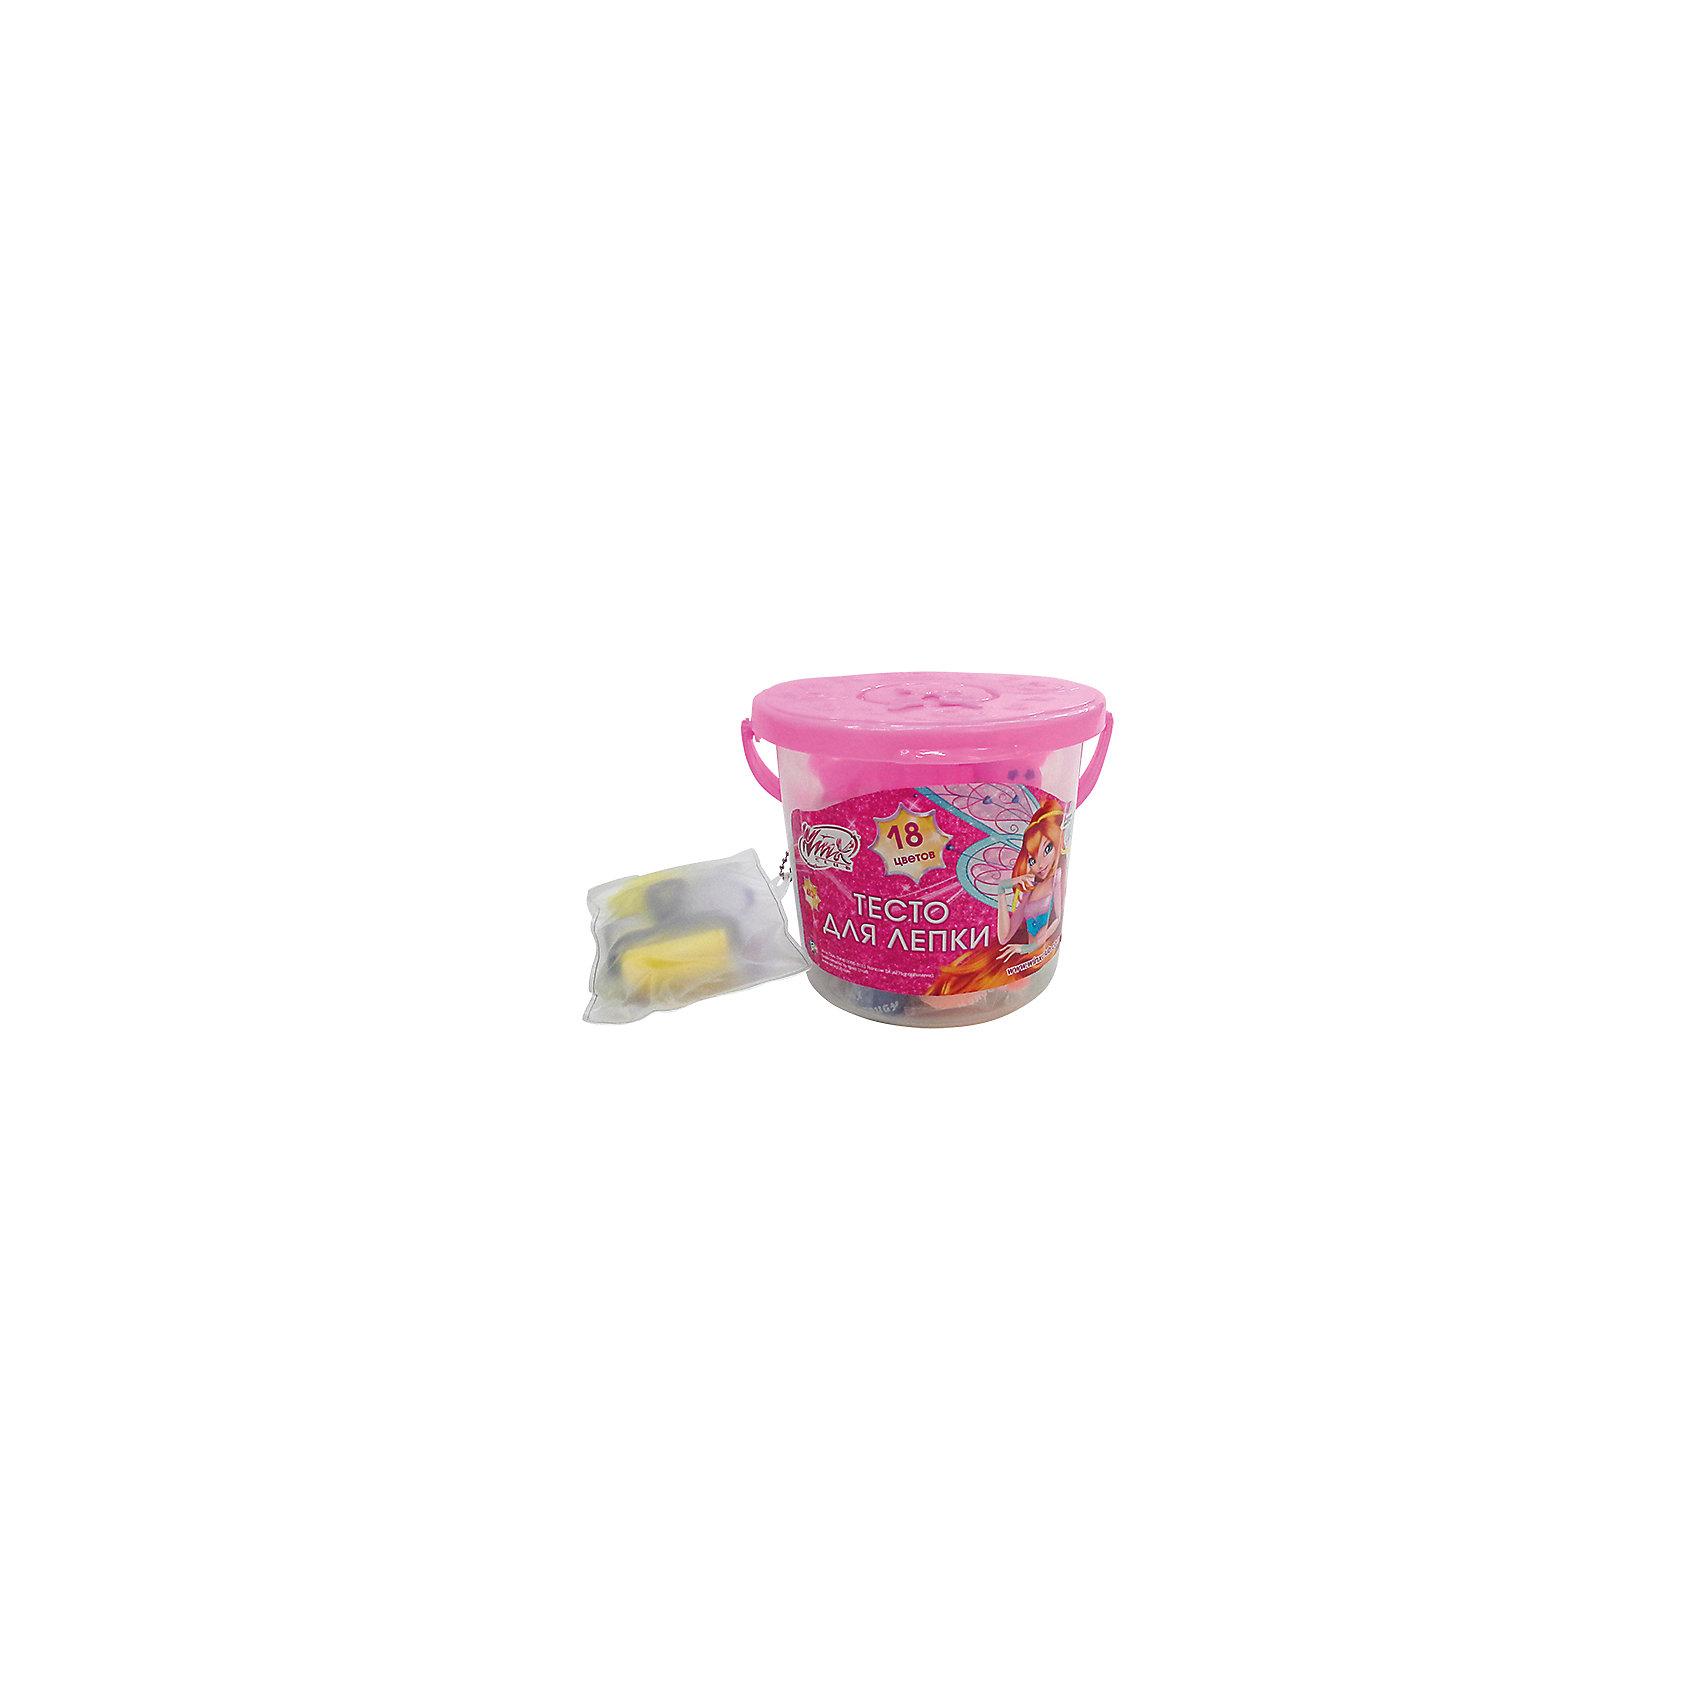 Тесто для лепки с аксессуарами, 18 цветов, Winx Club